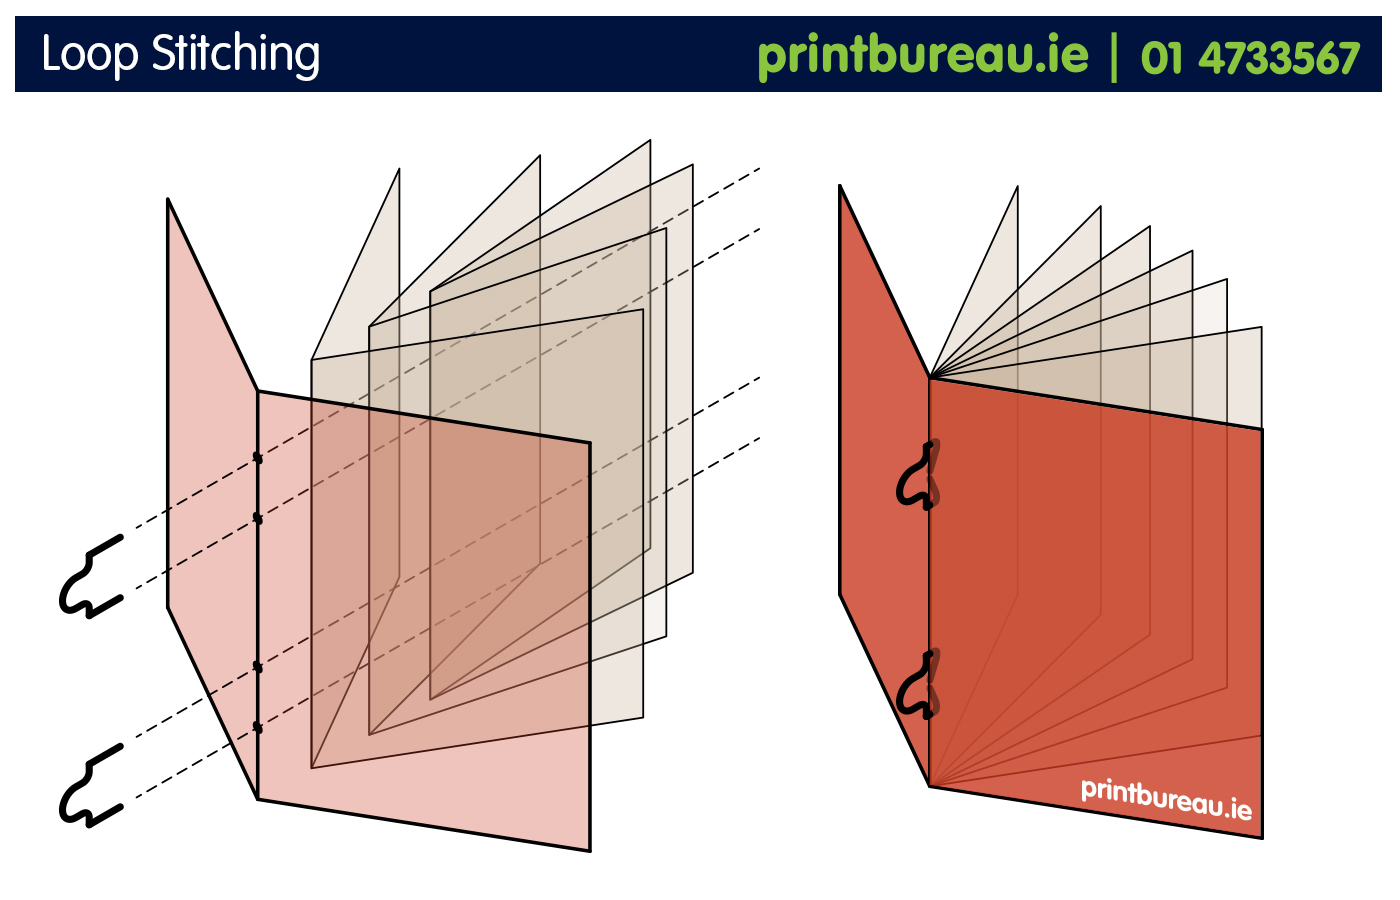 Print Bureau Loop Stitiching